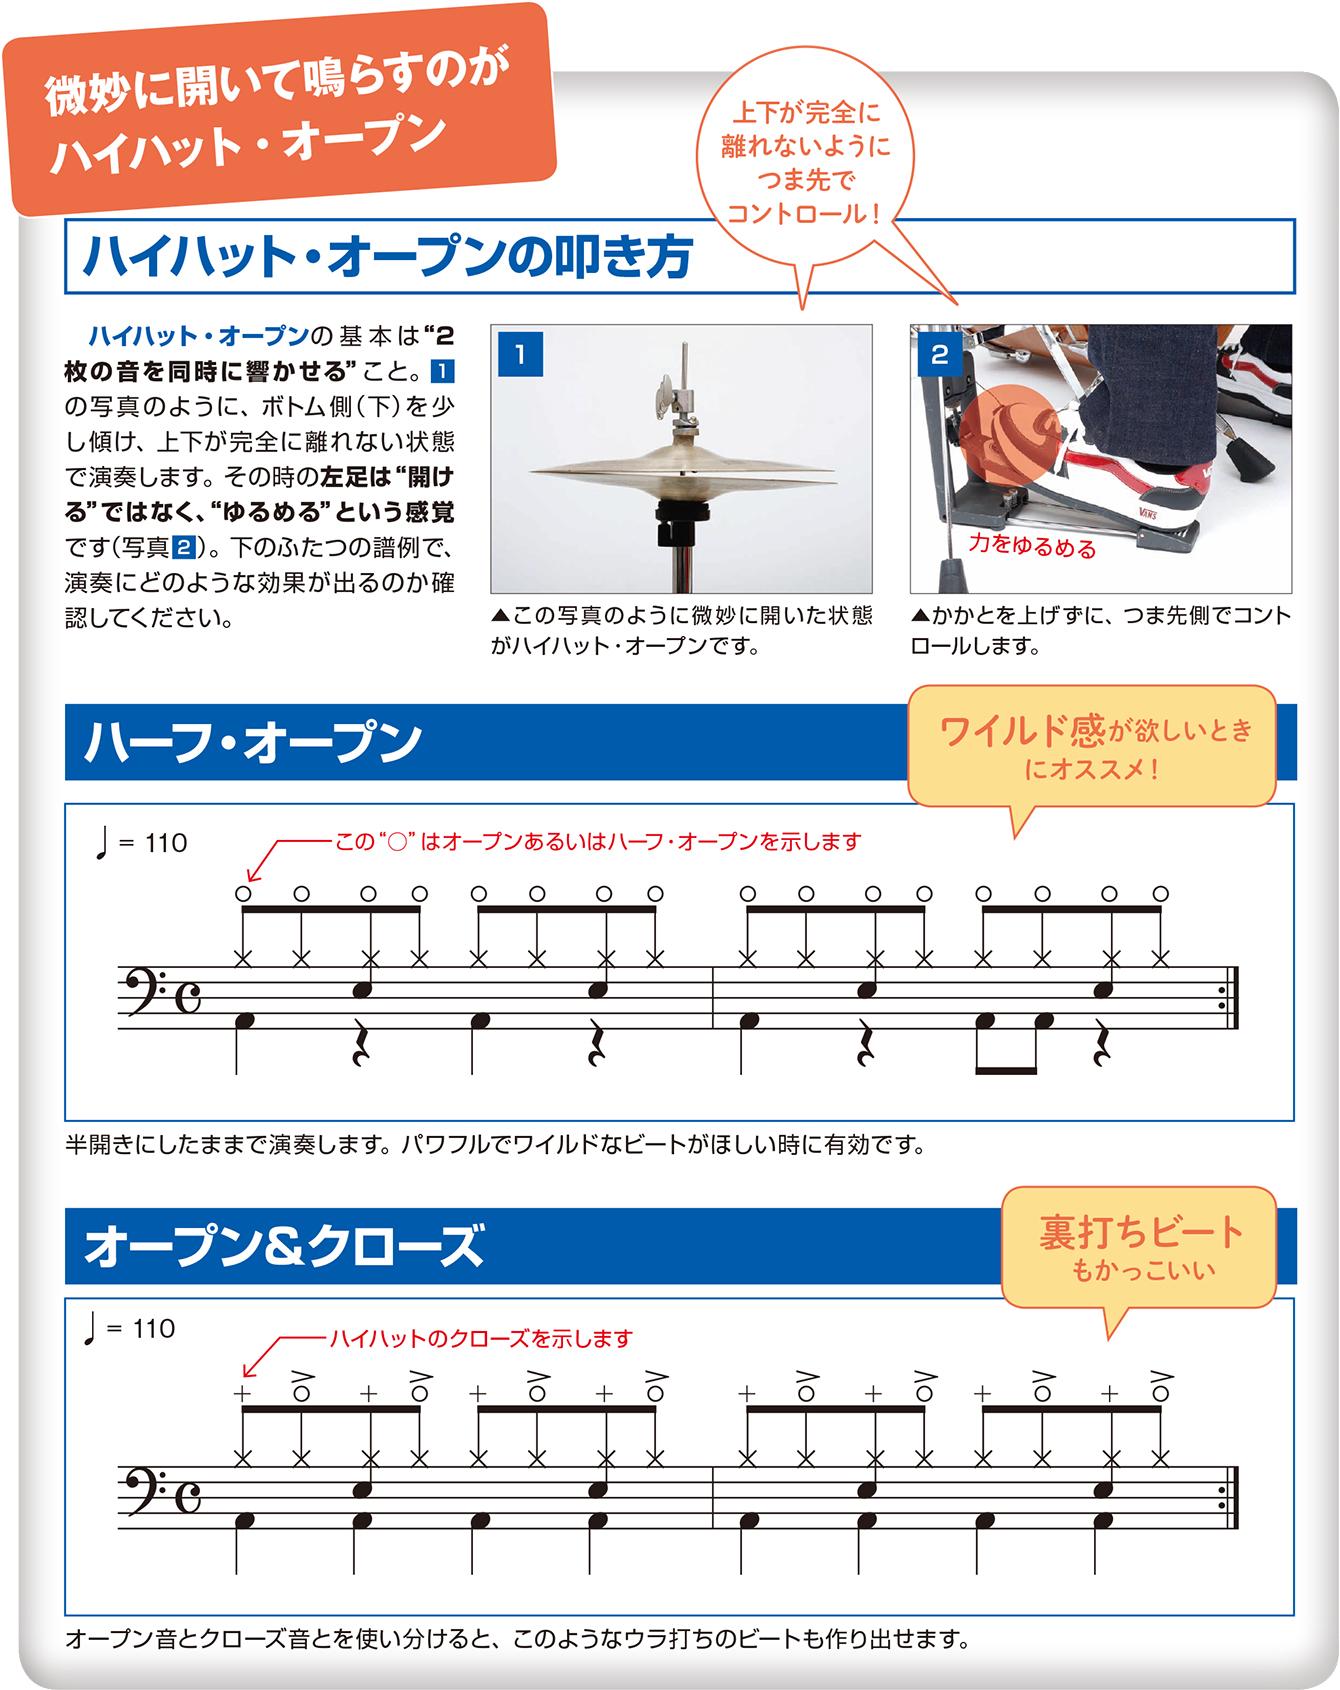 http://musicschool-navi.jp/columns/columns/assets_c/2017/keion03/keion_v3_drum_04.jpg